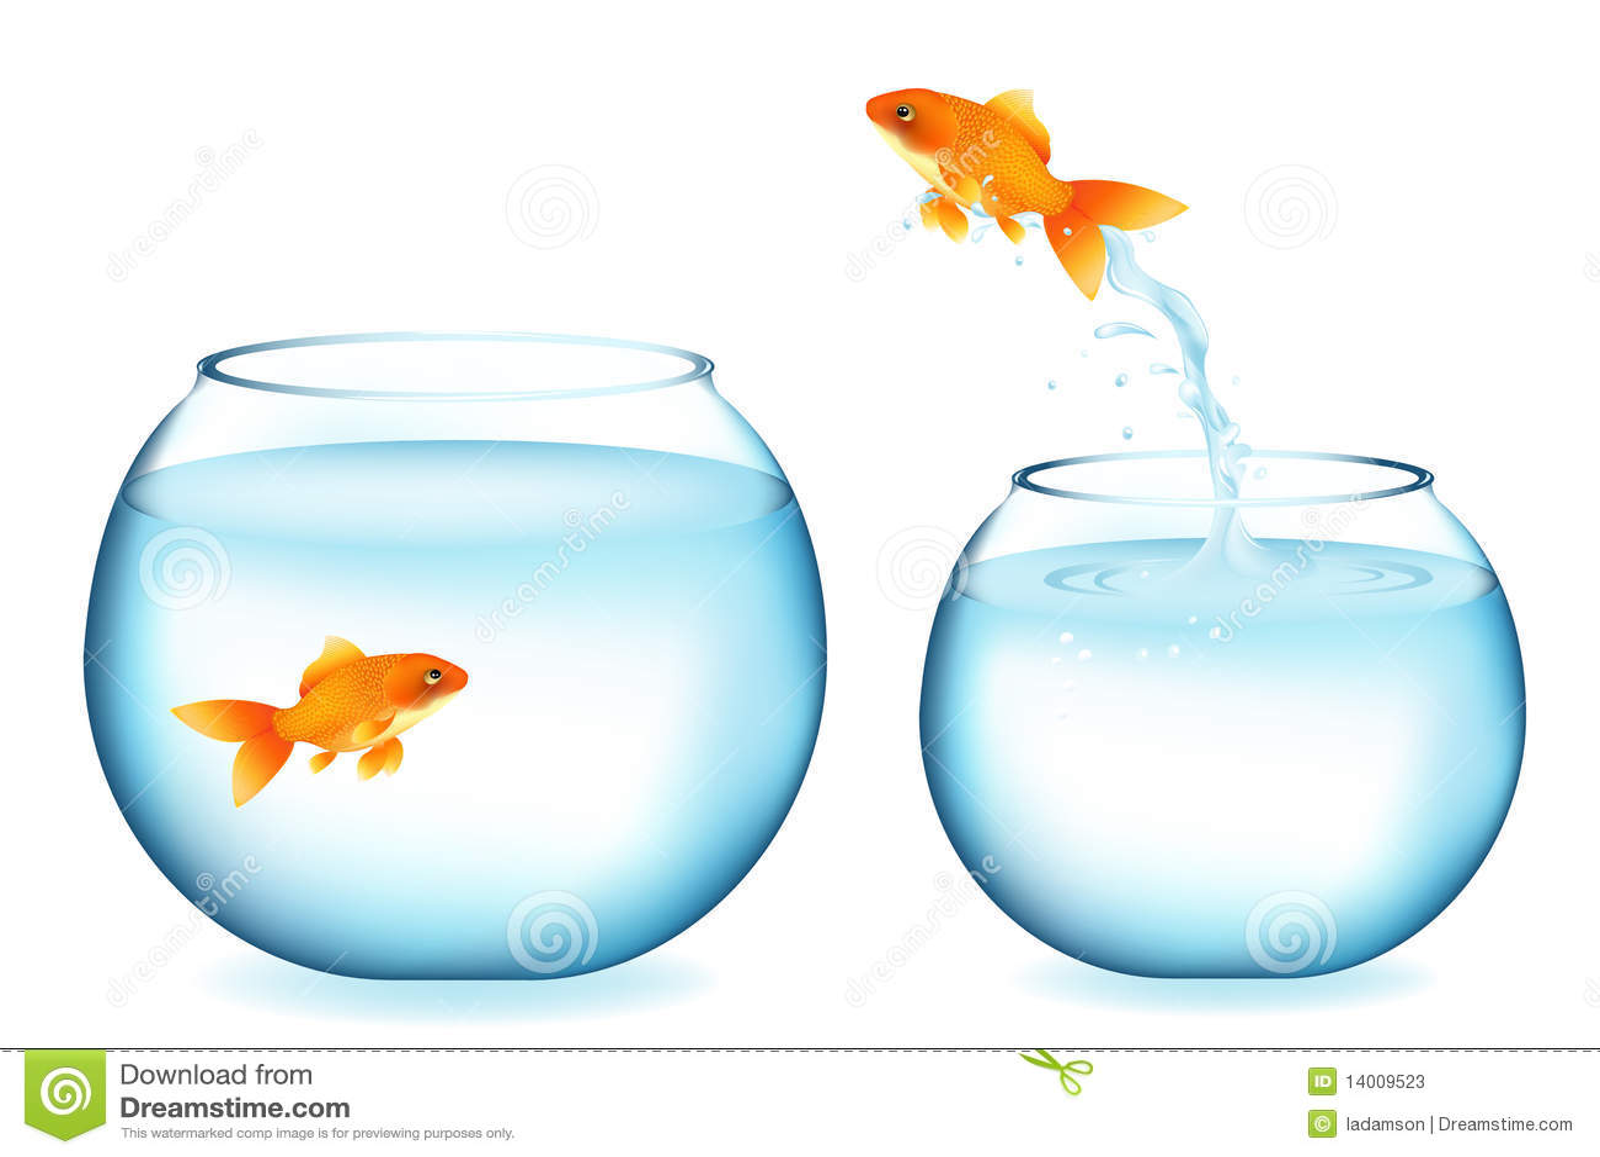 O Goldfish que salta ao outro Goldfish